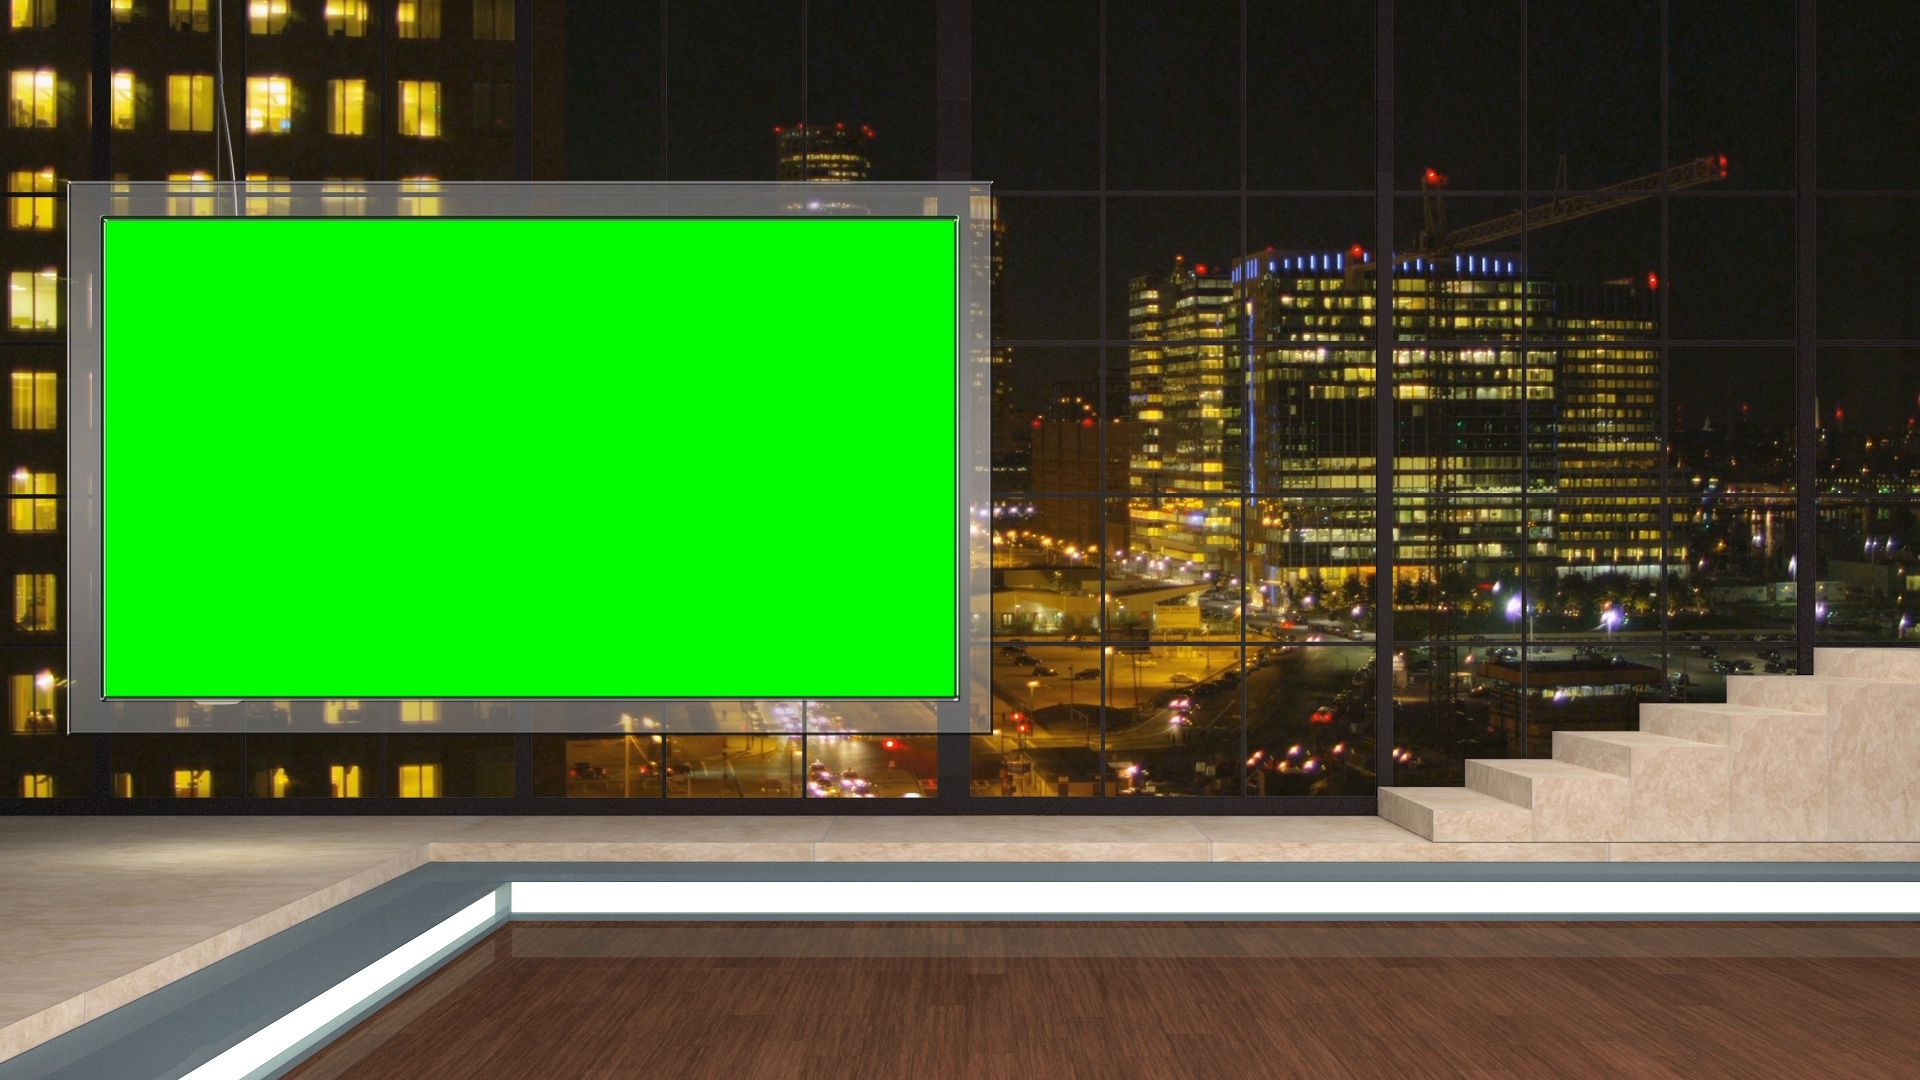 104 Hd News Talkshow Tv Virtual Studio Green Screen Background Night City Mon Stock Foot Green Screen Video Backgrounds Virtual Studio Green Screen Backgrounds